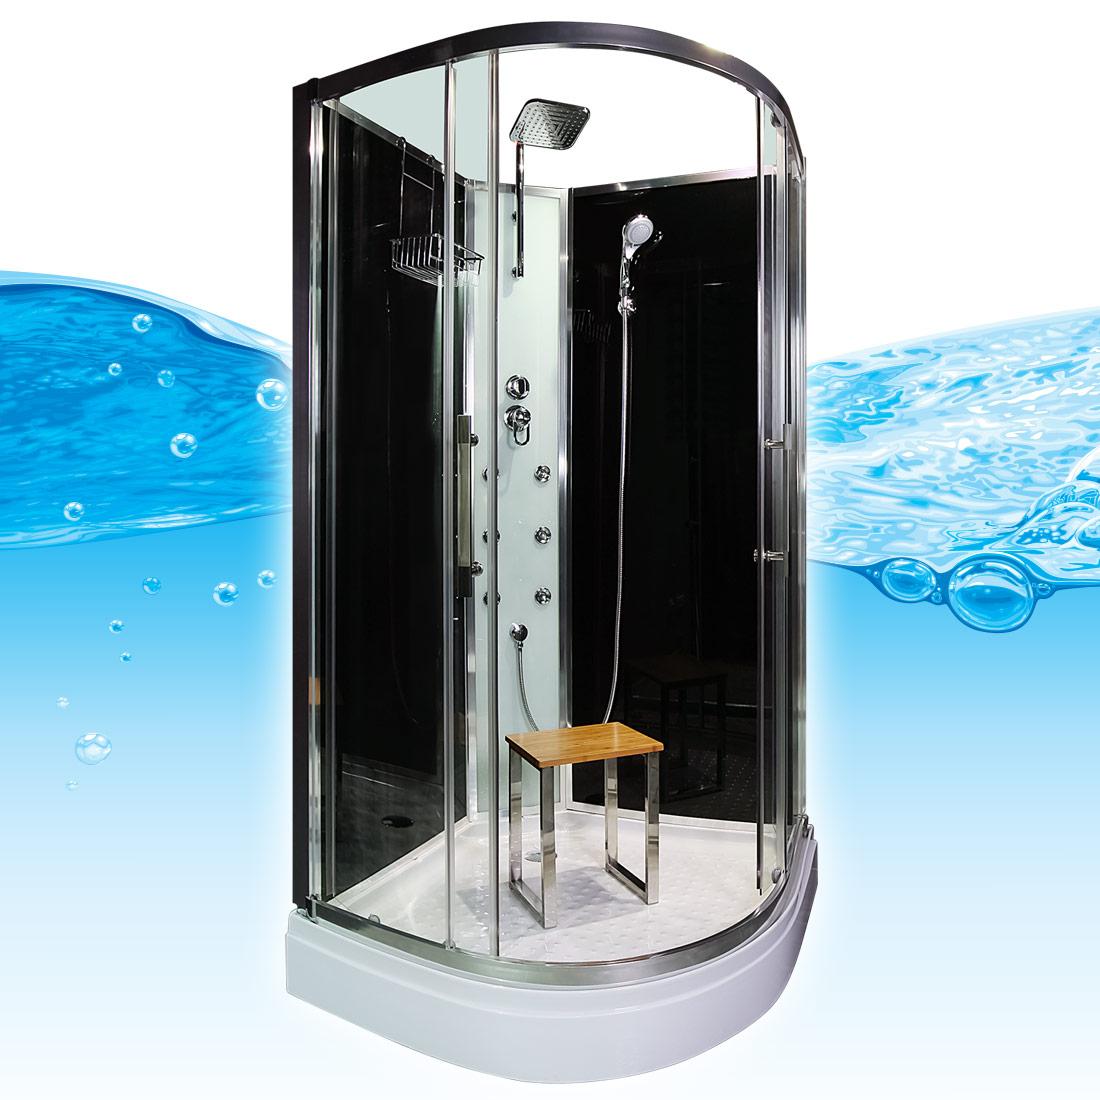 acquavapore quick16 0300 dusche duschtempel komplette duschkabine 80x80 ebay. Black Bedroom Furniture Sets. Home Design Ideas